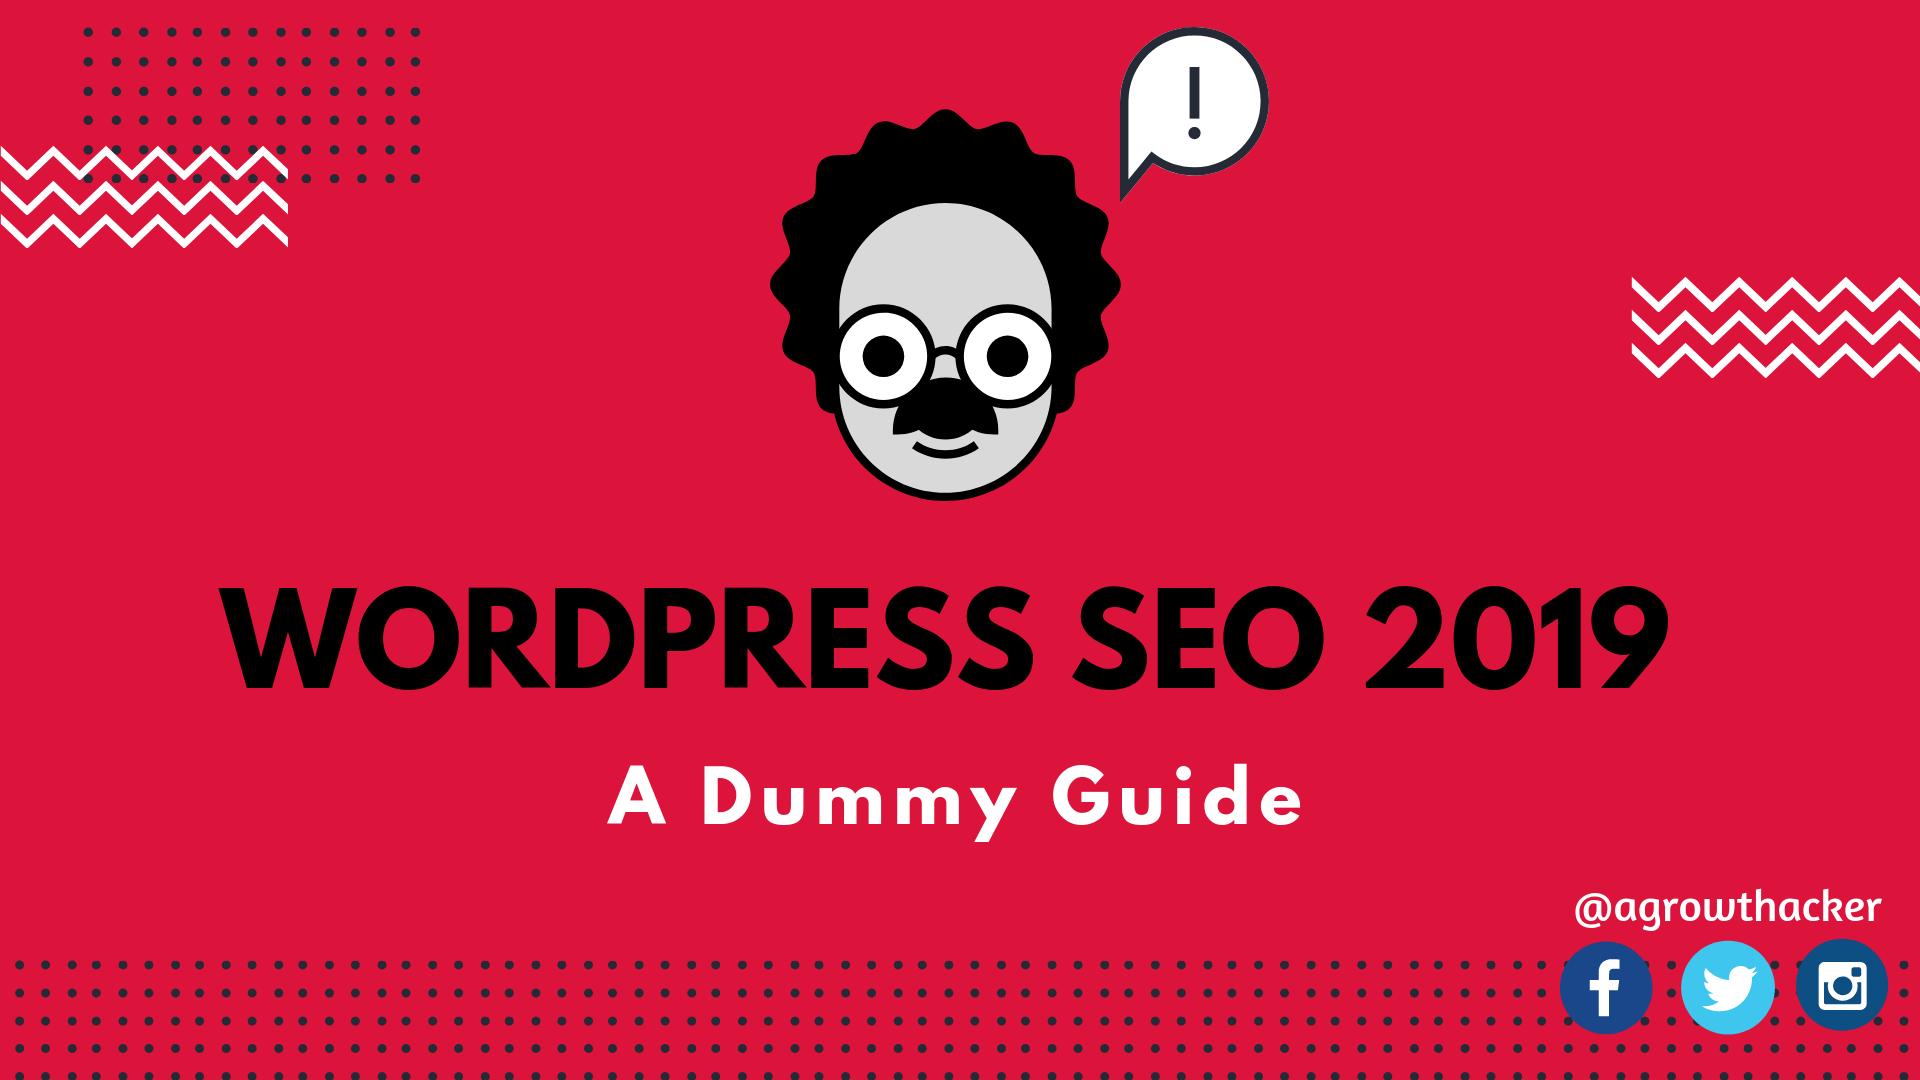 A Guide to WordPress SEO 2019